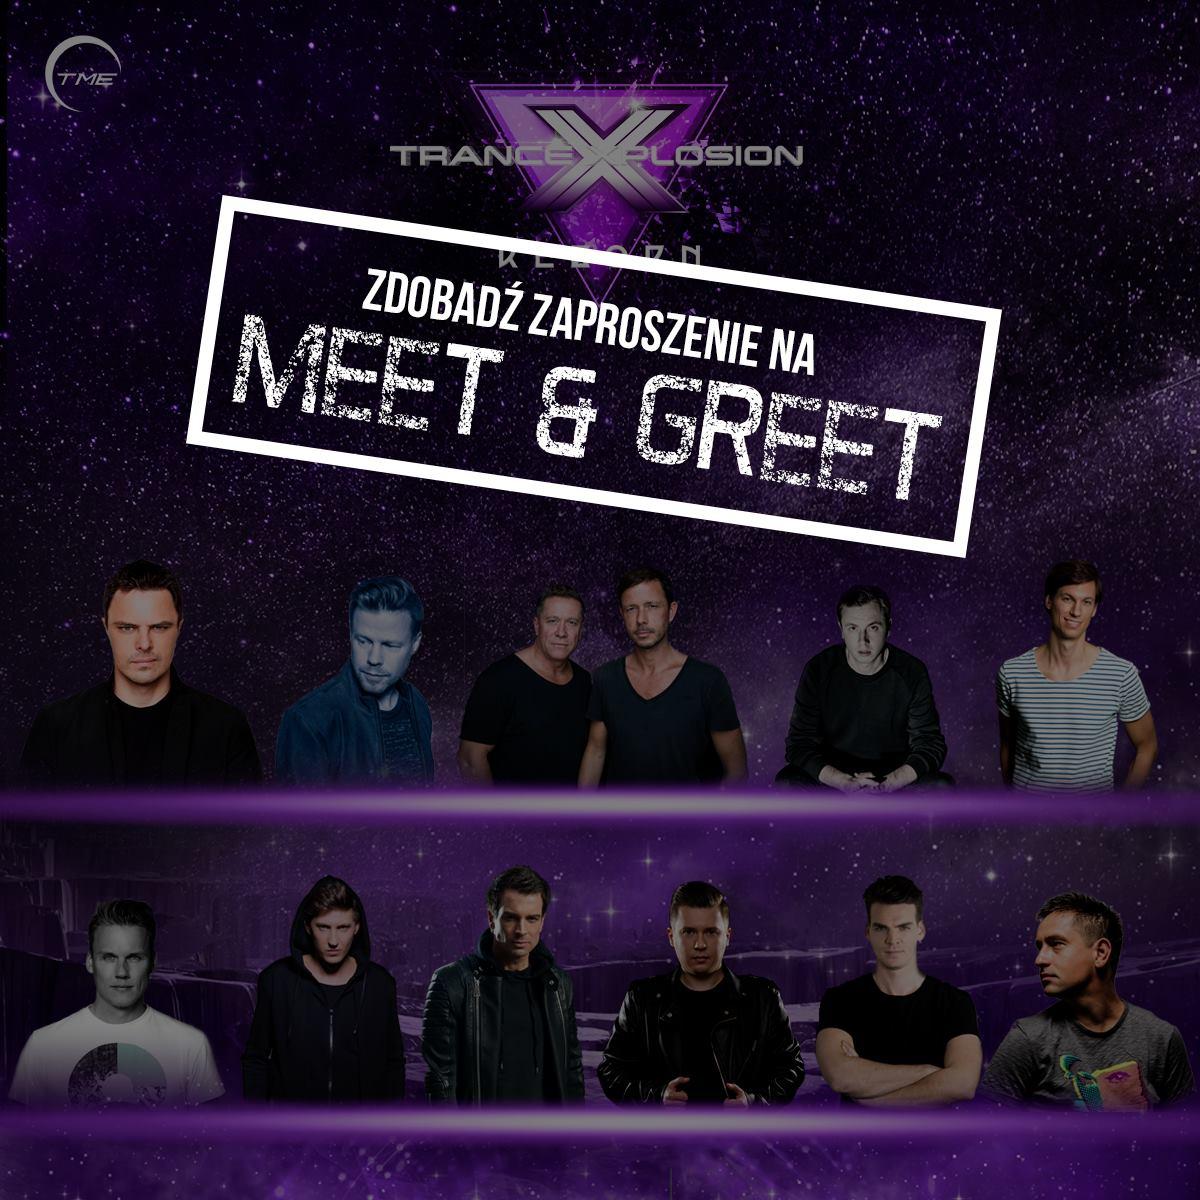 meet and greet trance xplosion tme agencja ergo arena sopot gdańsk